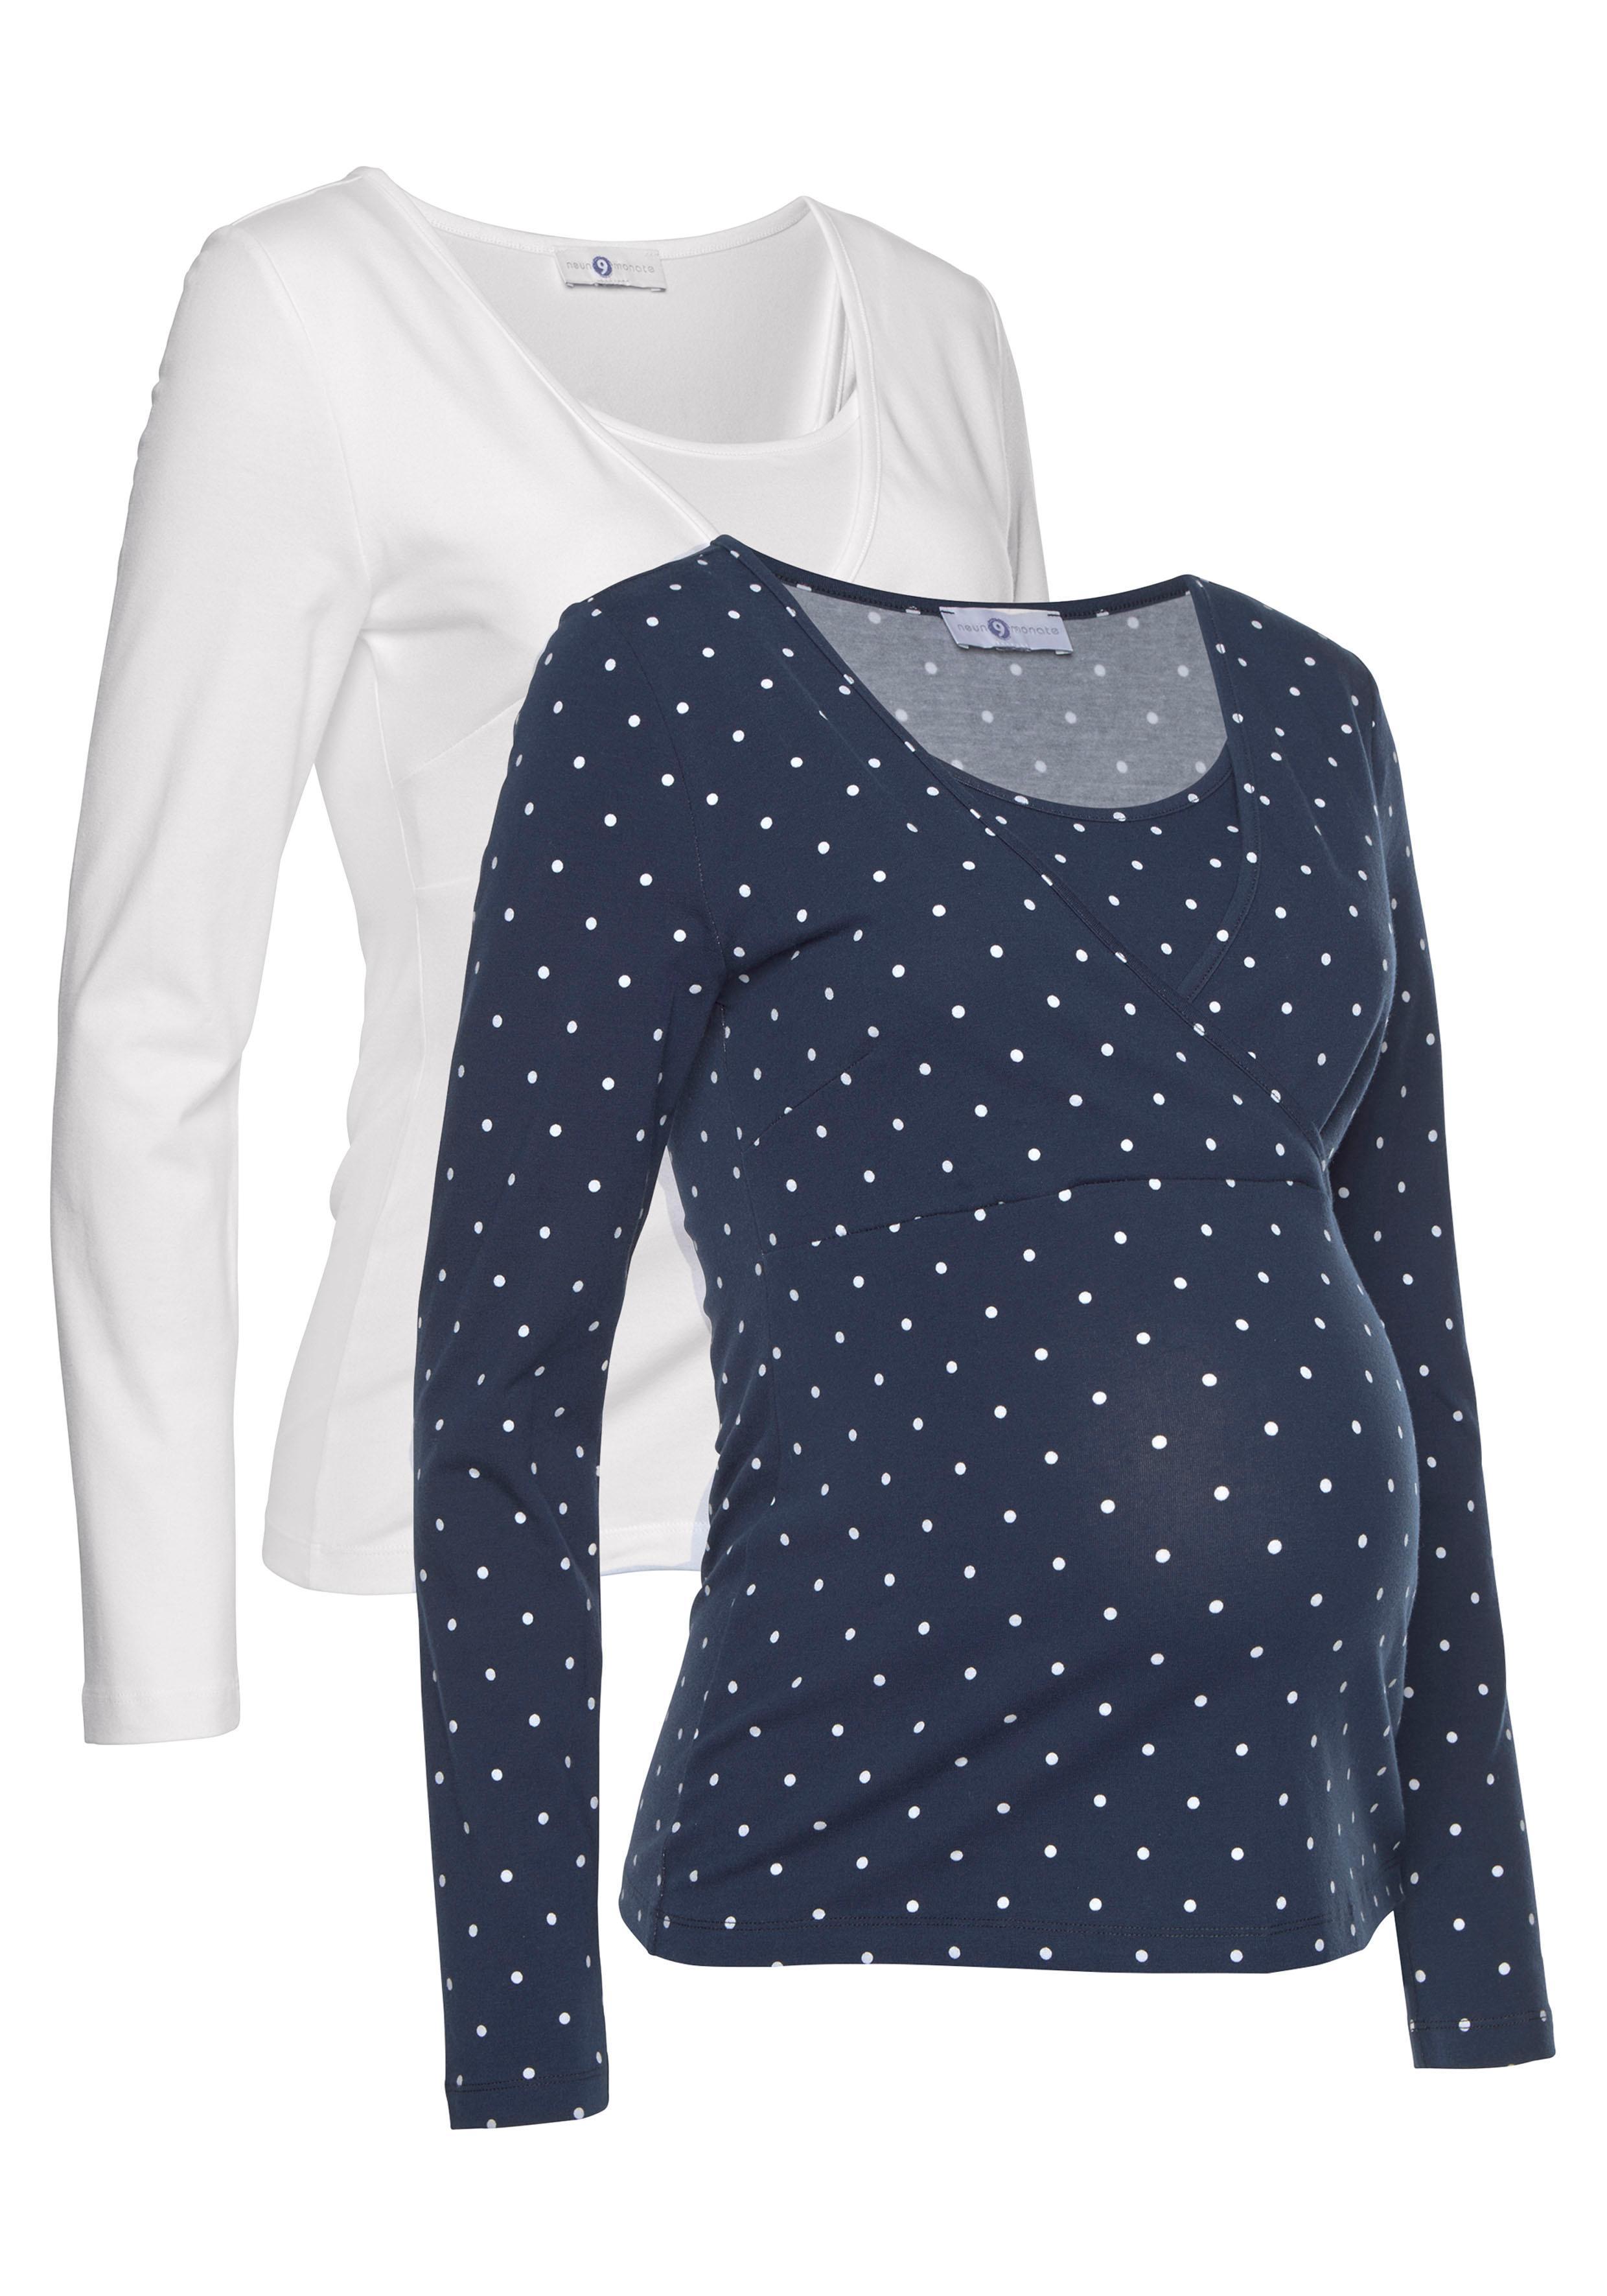 Neun Monate Umstandsshirt (Packung 2 tlg) | Bekleidung > Umstandsmode > Umstandsshirts | Bunt | Neun Monate